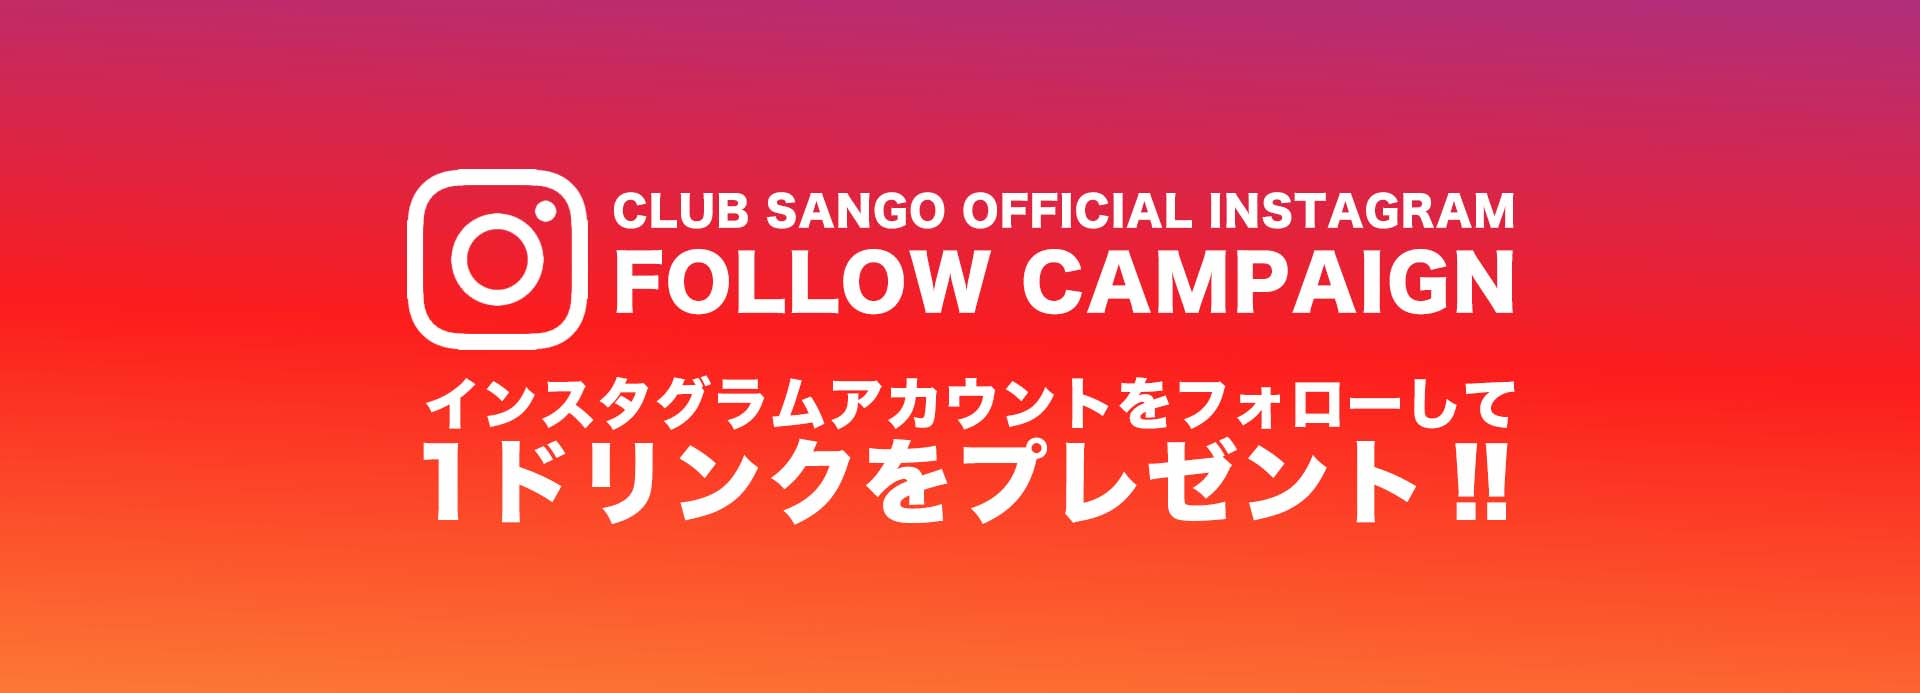 CLUB SANGO 公式インスタグラムアカウントをフォローして1ドリンクをプレゼント!